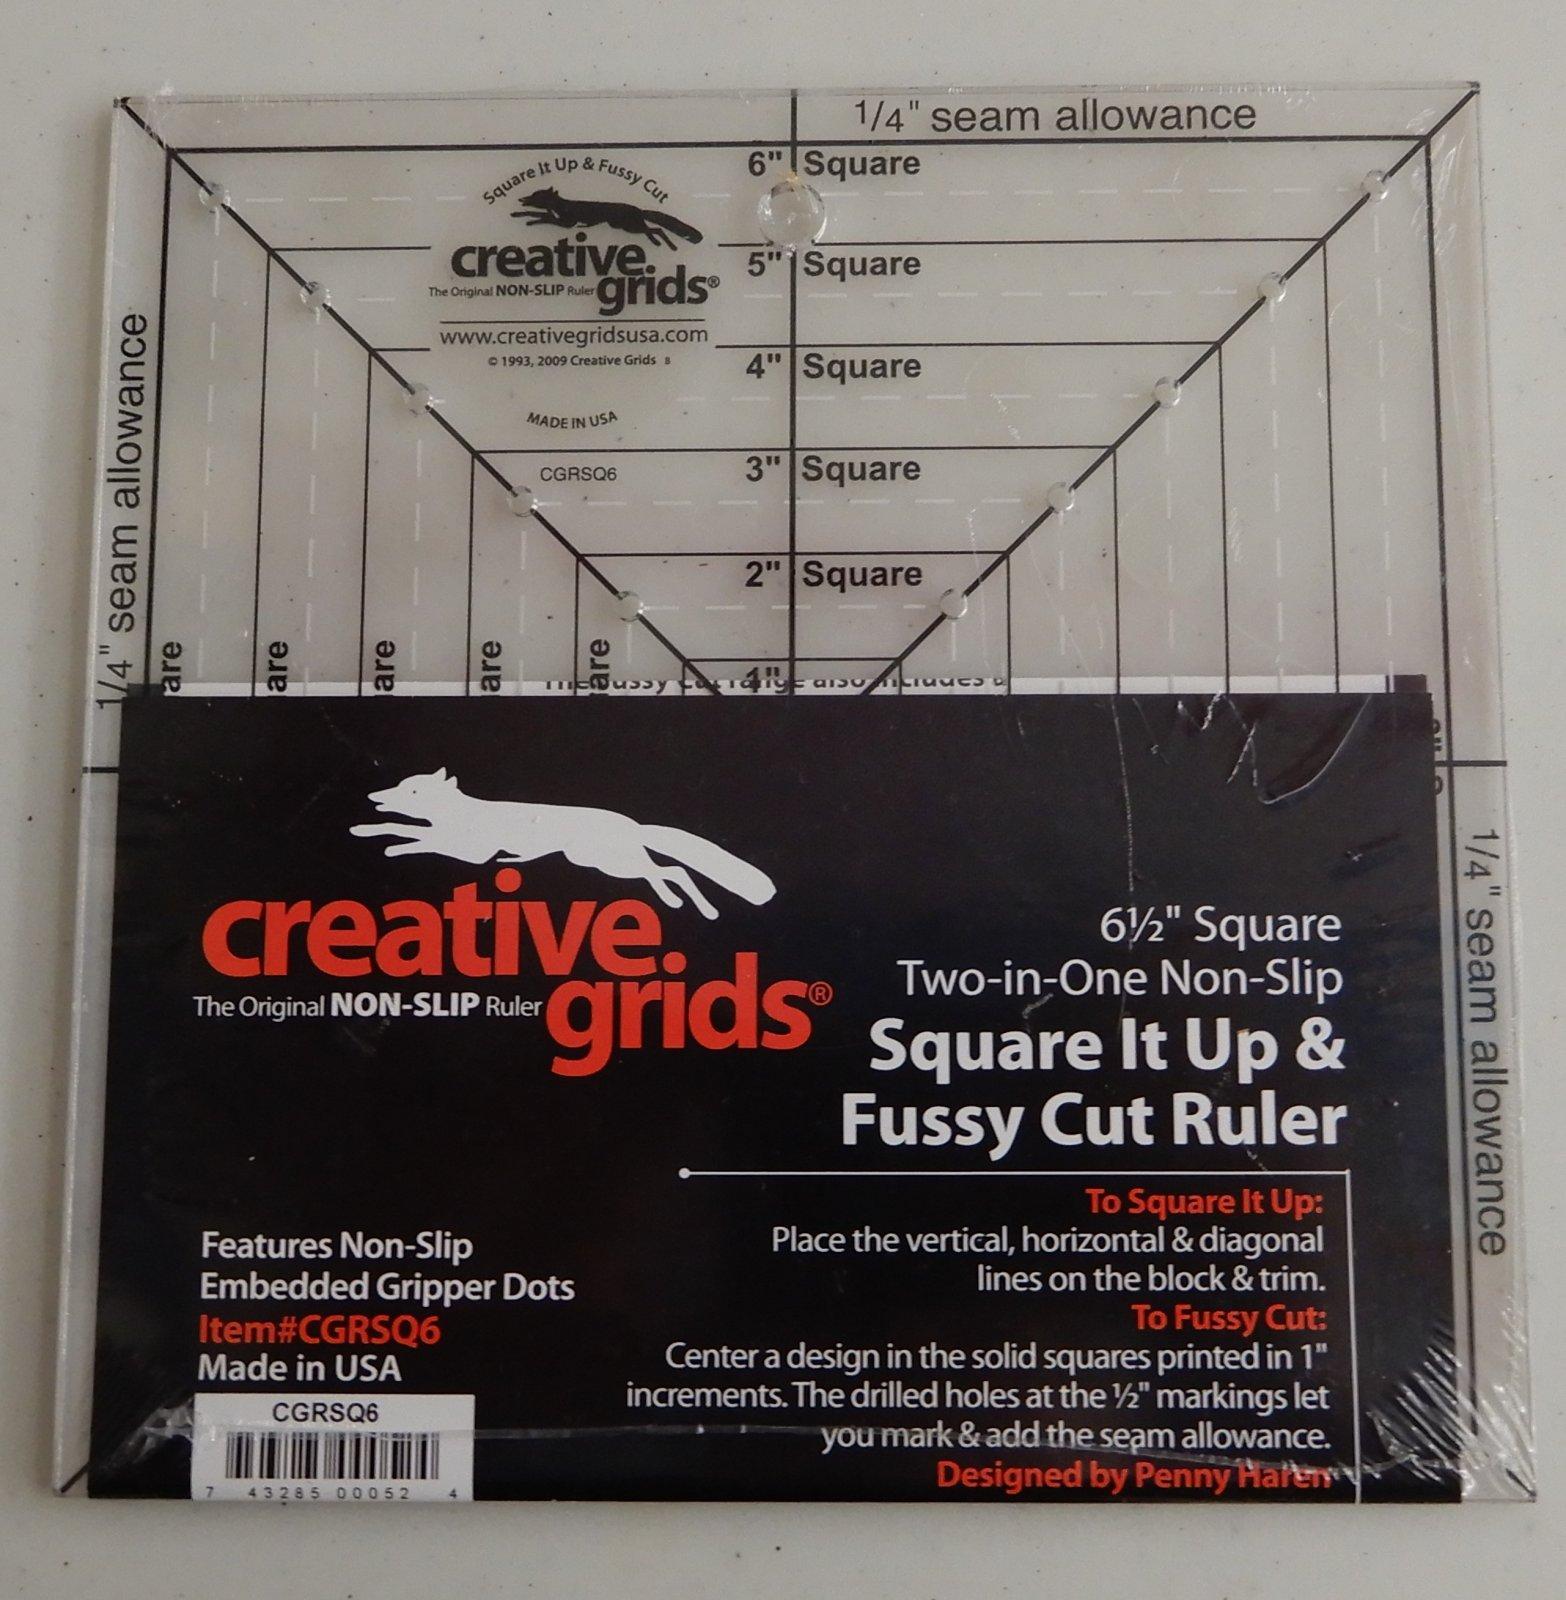 Creative Grids 6 1/2 Square It Up & Fussy Cut Ruler